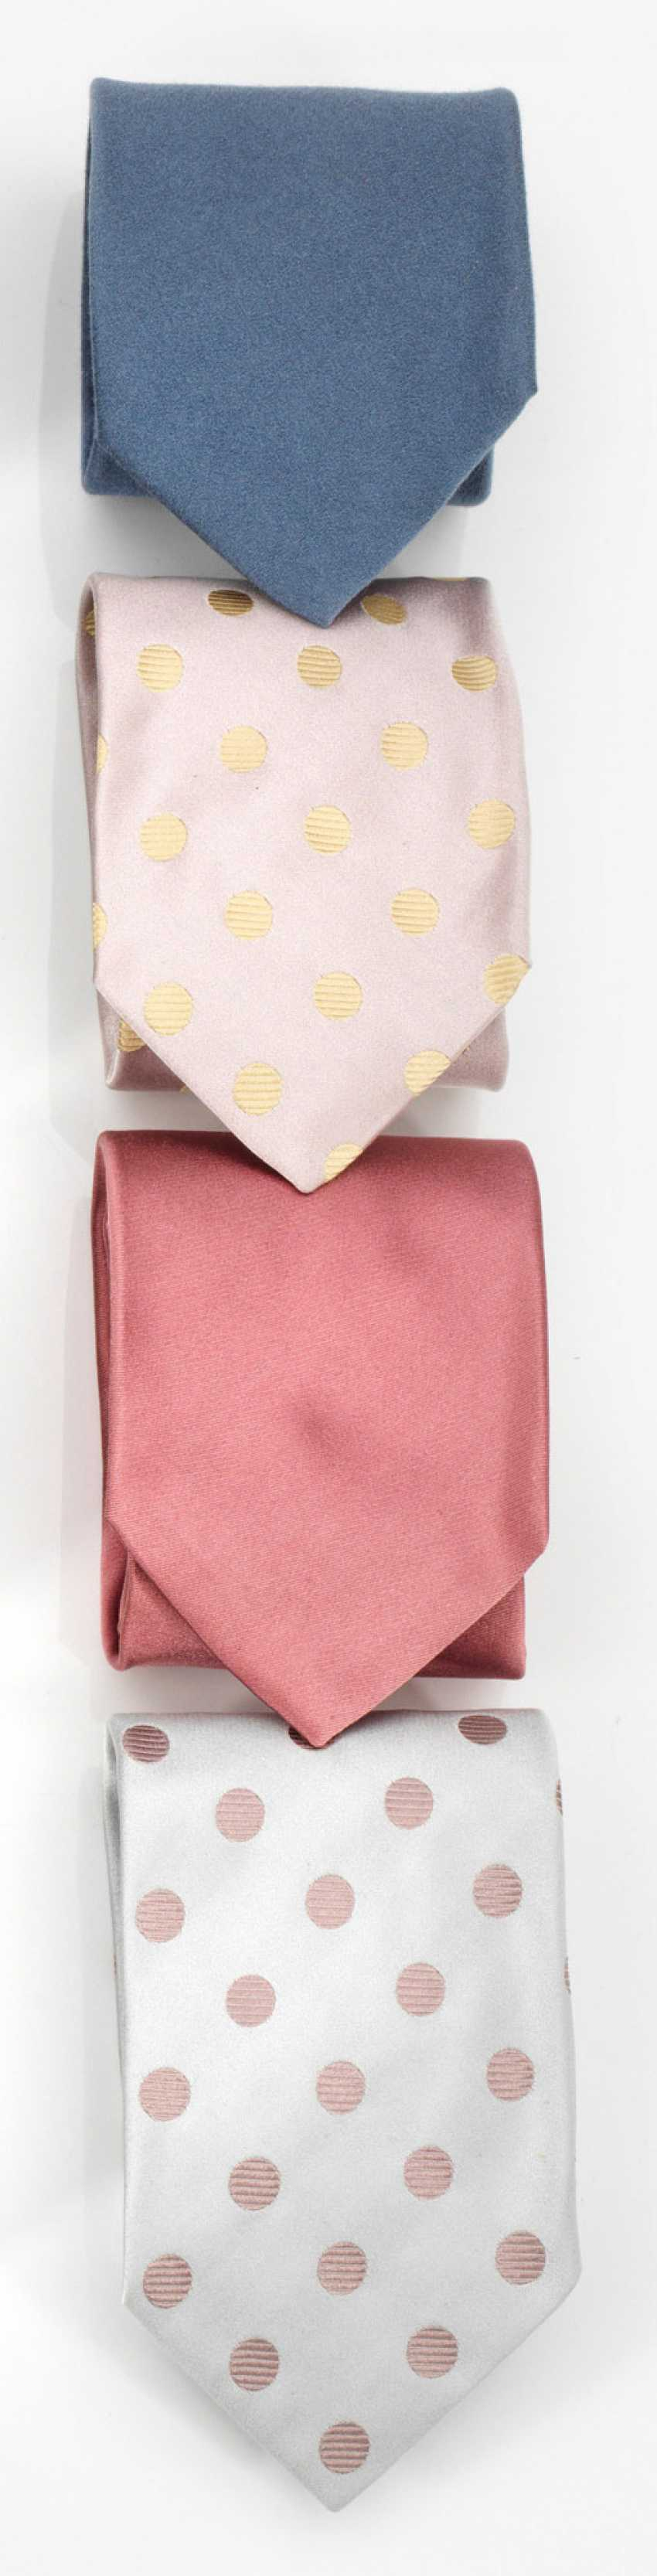 Четыре галстуки от JOOP! - фото 1